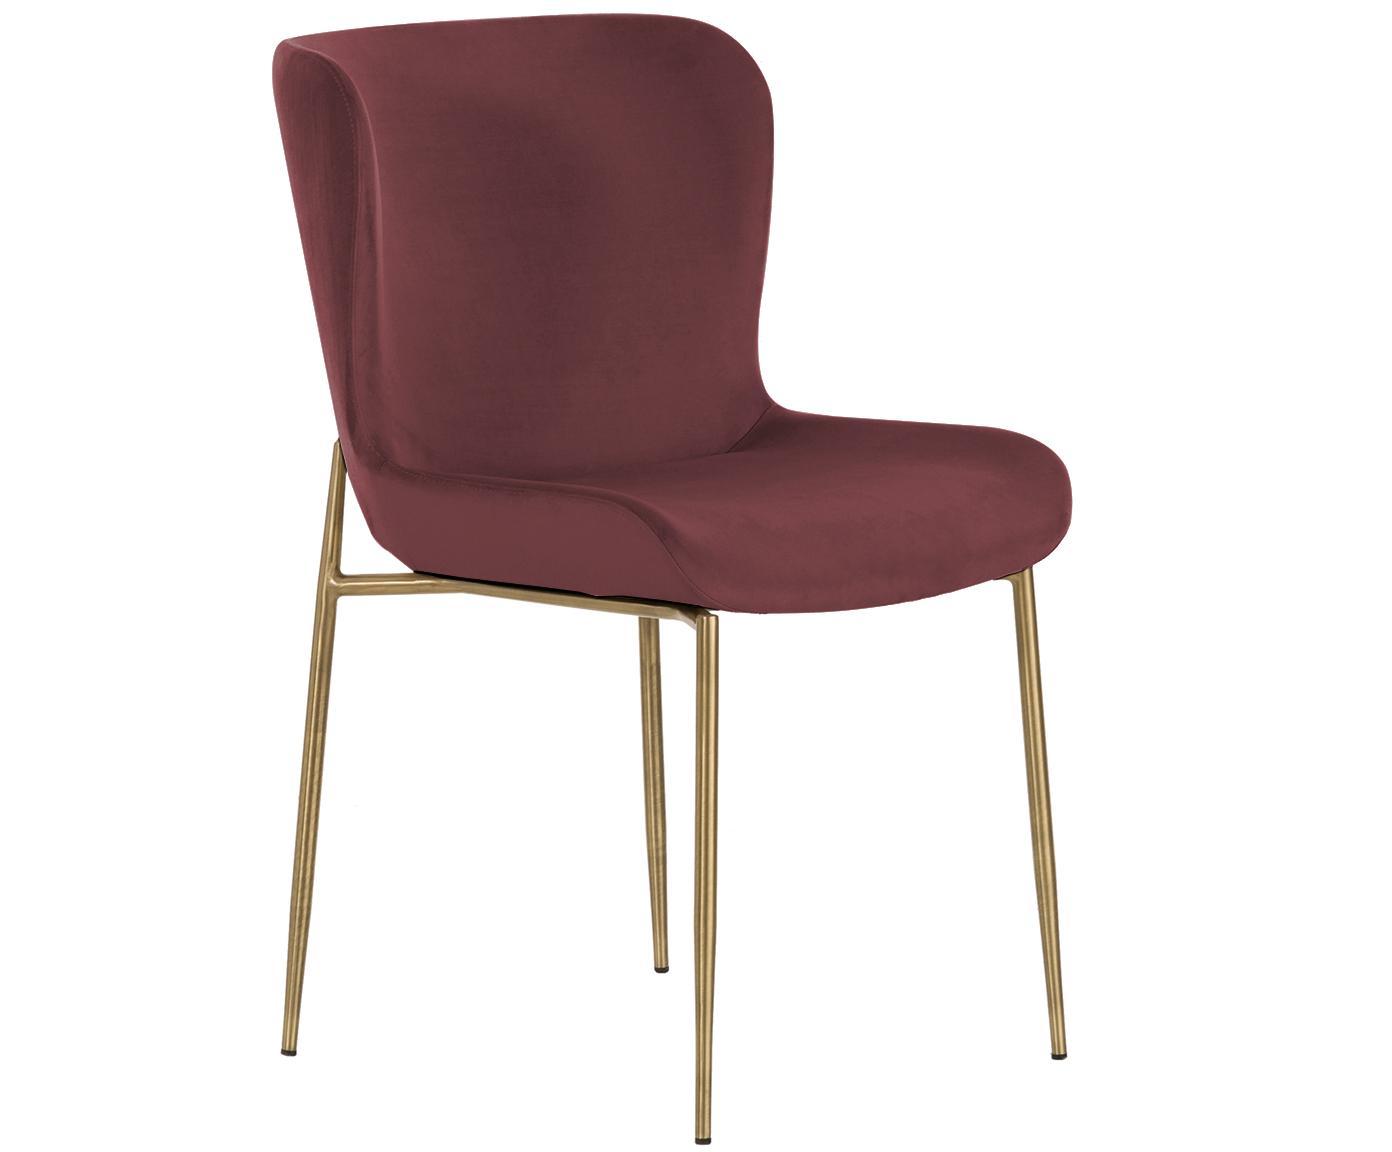 Sedia imbottita in velluto Tess, Rivestimento: velluto (poliestere) 30.0, Gambe: metallo rivestito, Velluto Bordeaux, gambe oro, Larg. 48 x Alt. 64 cm